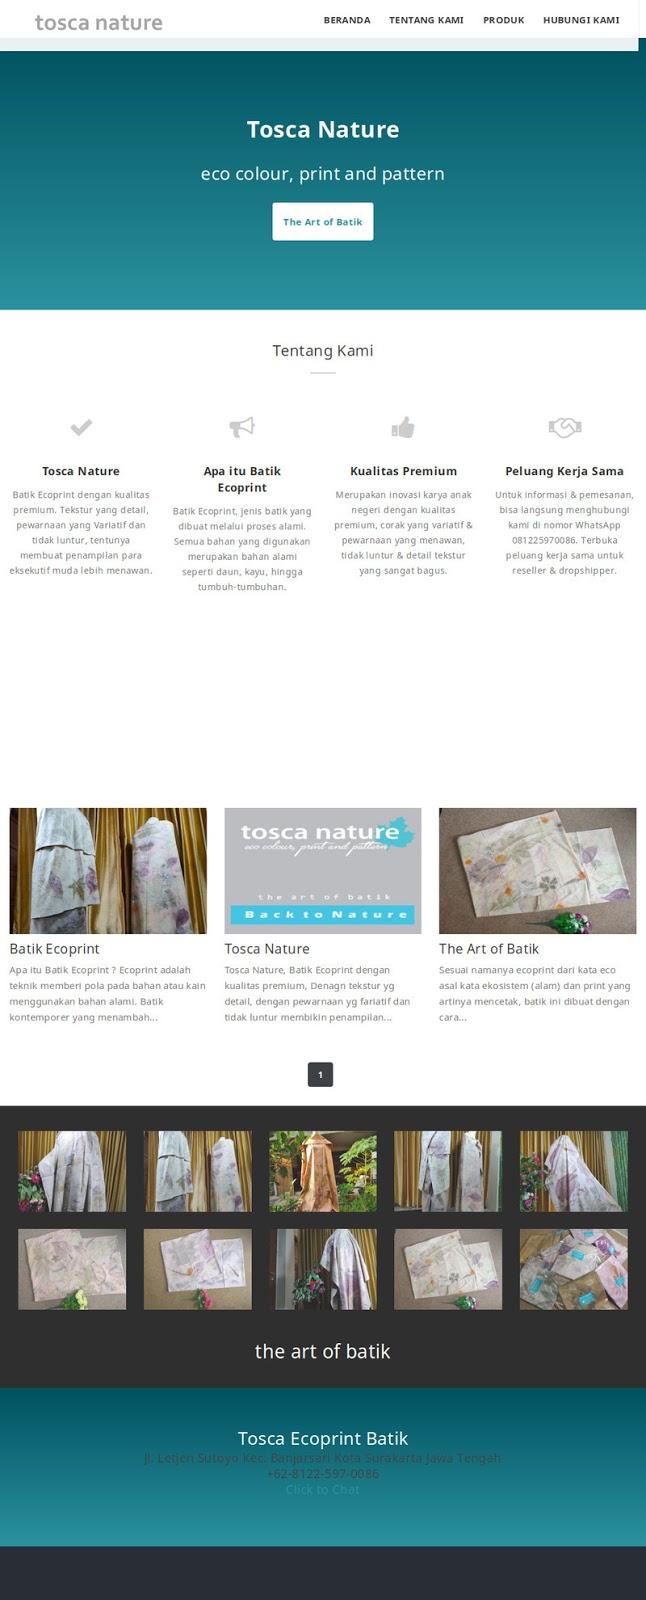 Tosca Ecoprint Batik